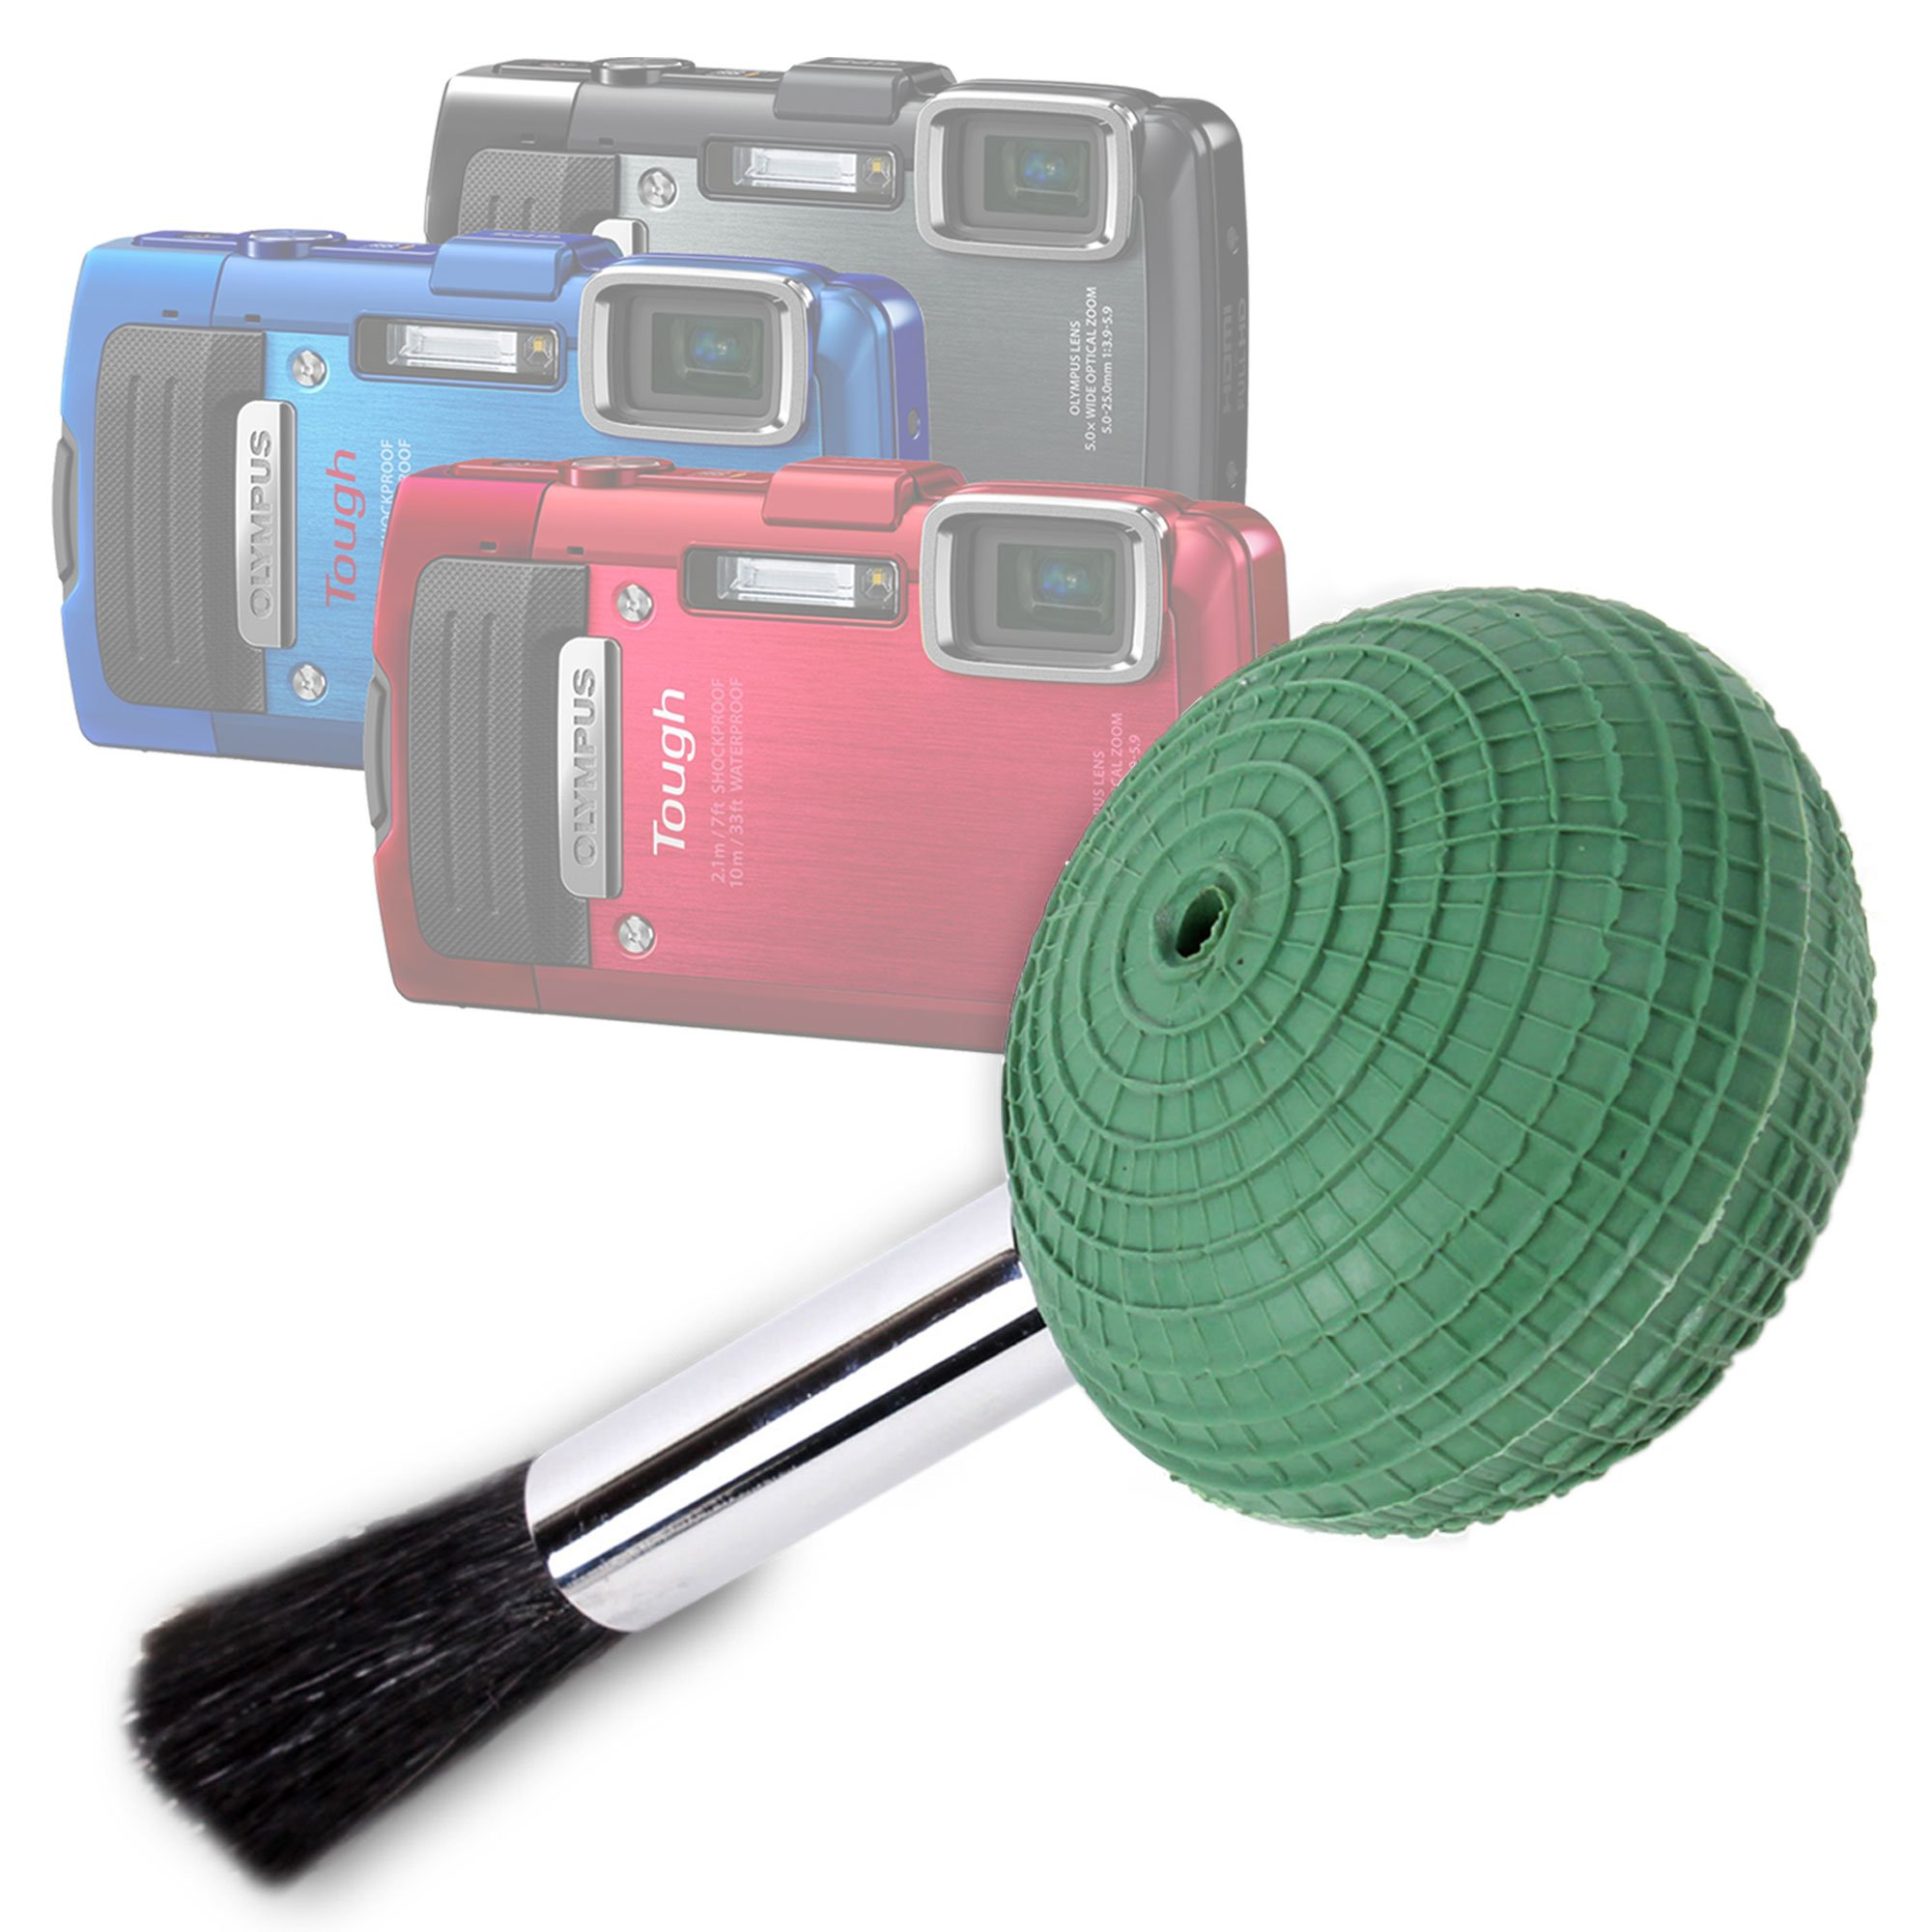 DURAGADGET Ultra-Fine Lens Blower Brush Cleaner for Olympus Stylus Tough TG-830 / TG-835 Digital Compact Camera